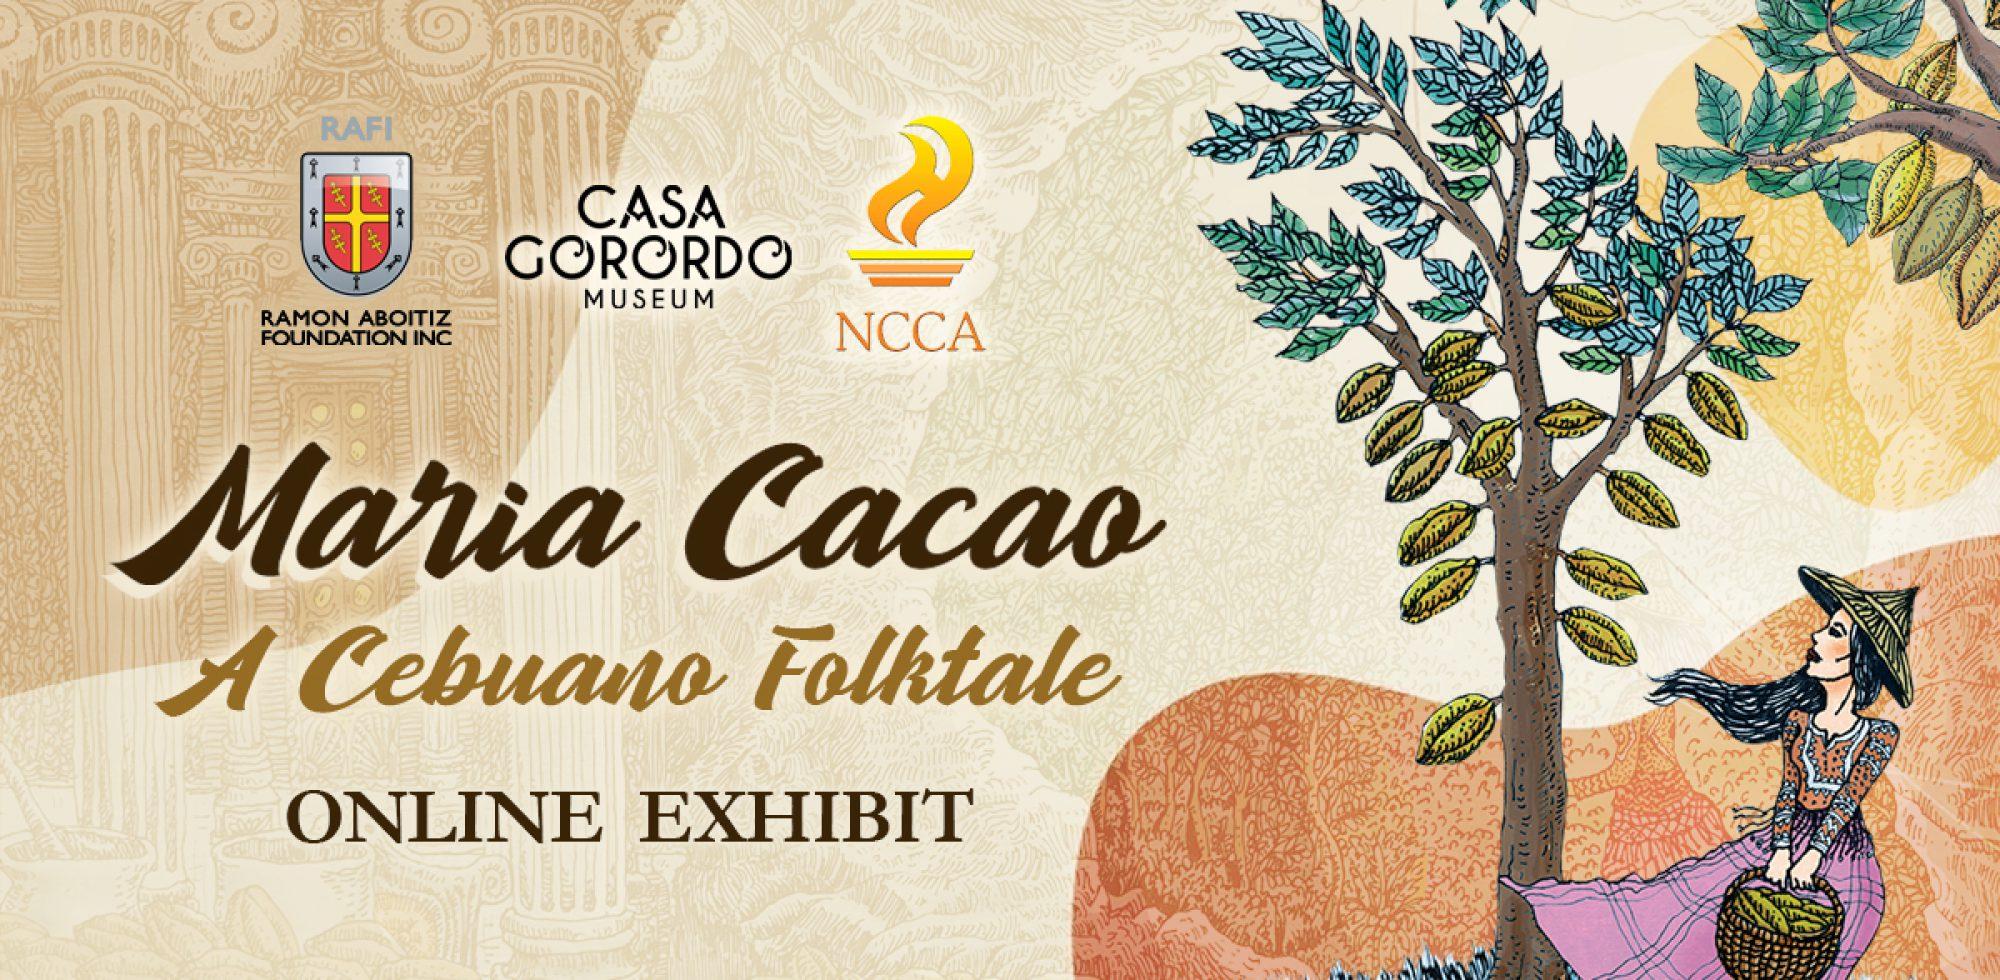 Maria Cacao NEW